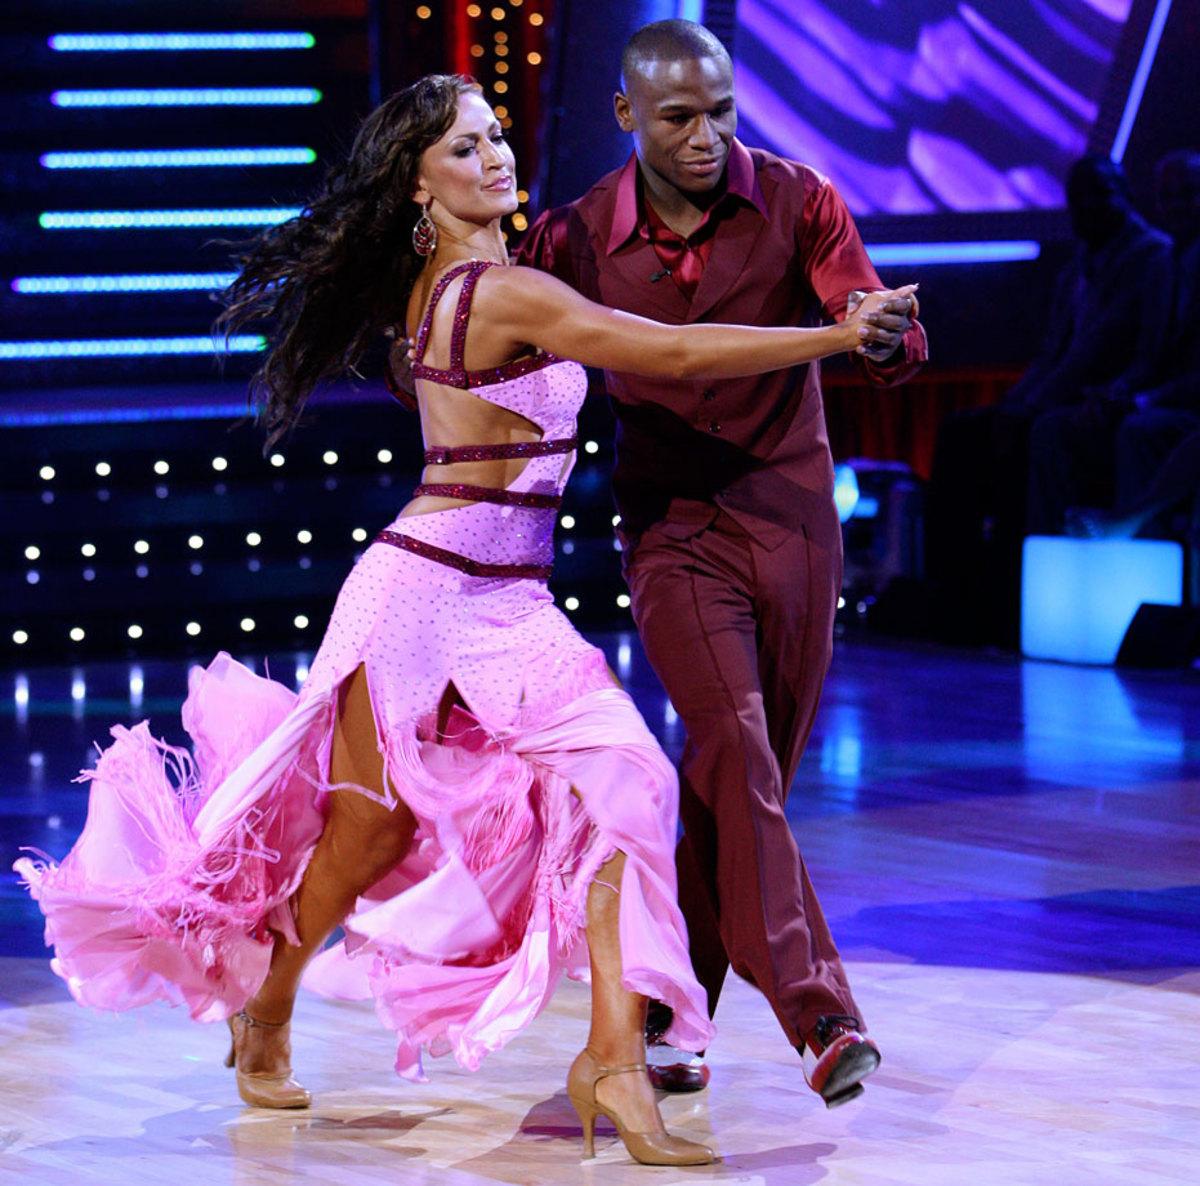 floyd-mayweather-jr-karina-smirnoff-dancing-with-the-stars.jpg